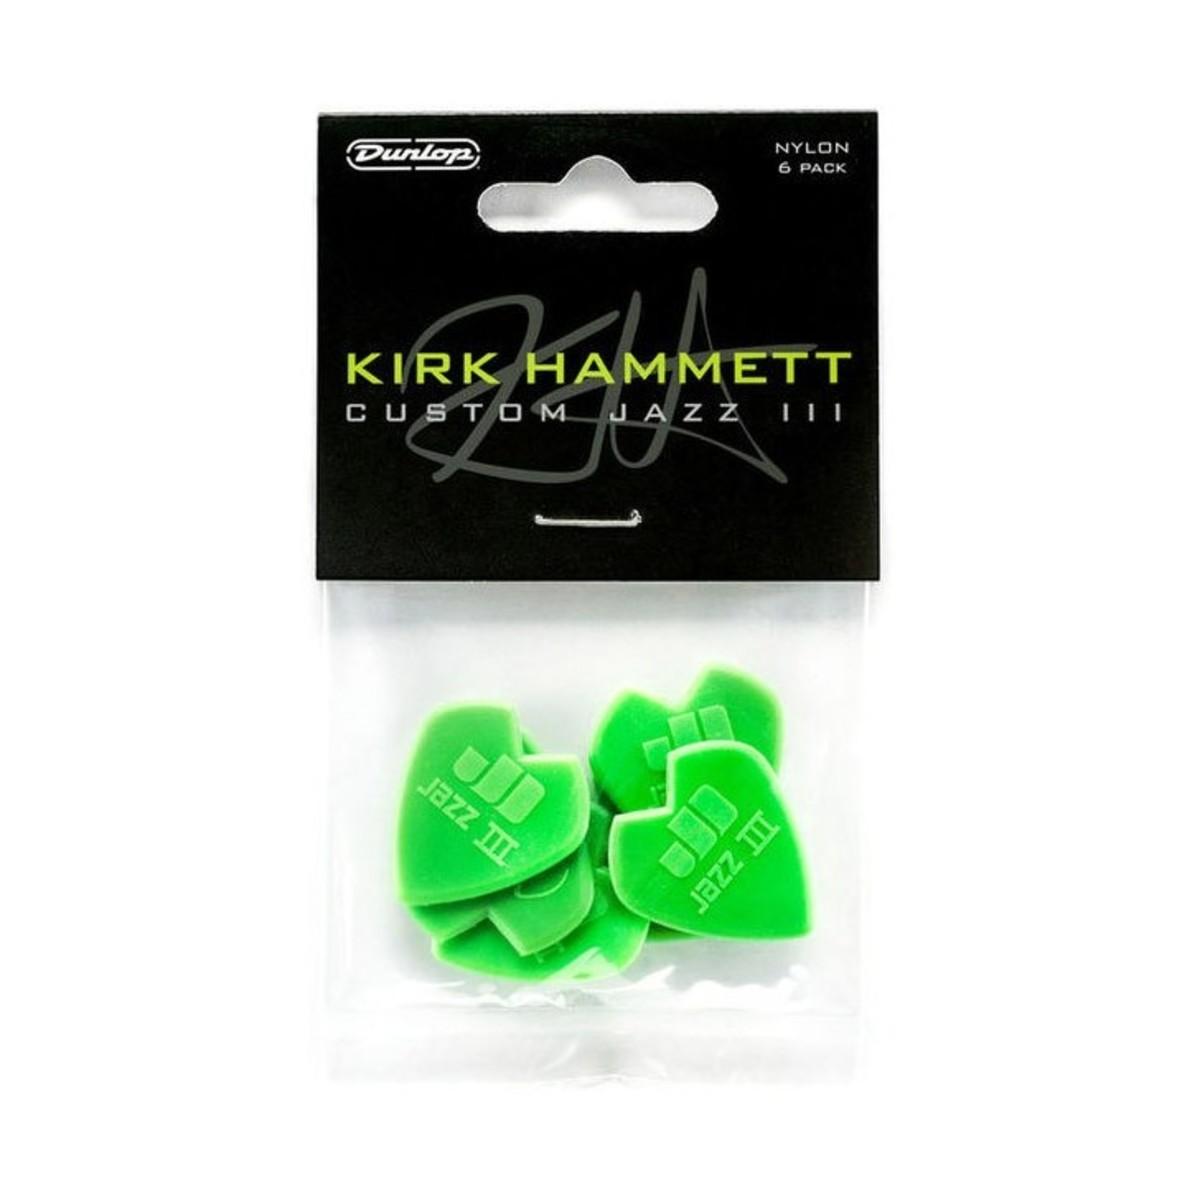 dunlop kirk hammett custom jazz iii picks pack of 6 at gear4music. Black Bedroom Furniture Sets. Home Design Ideas